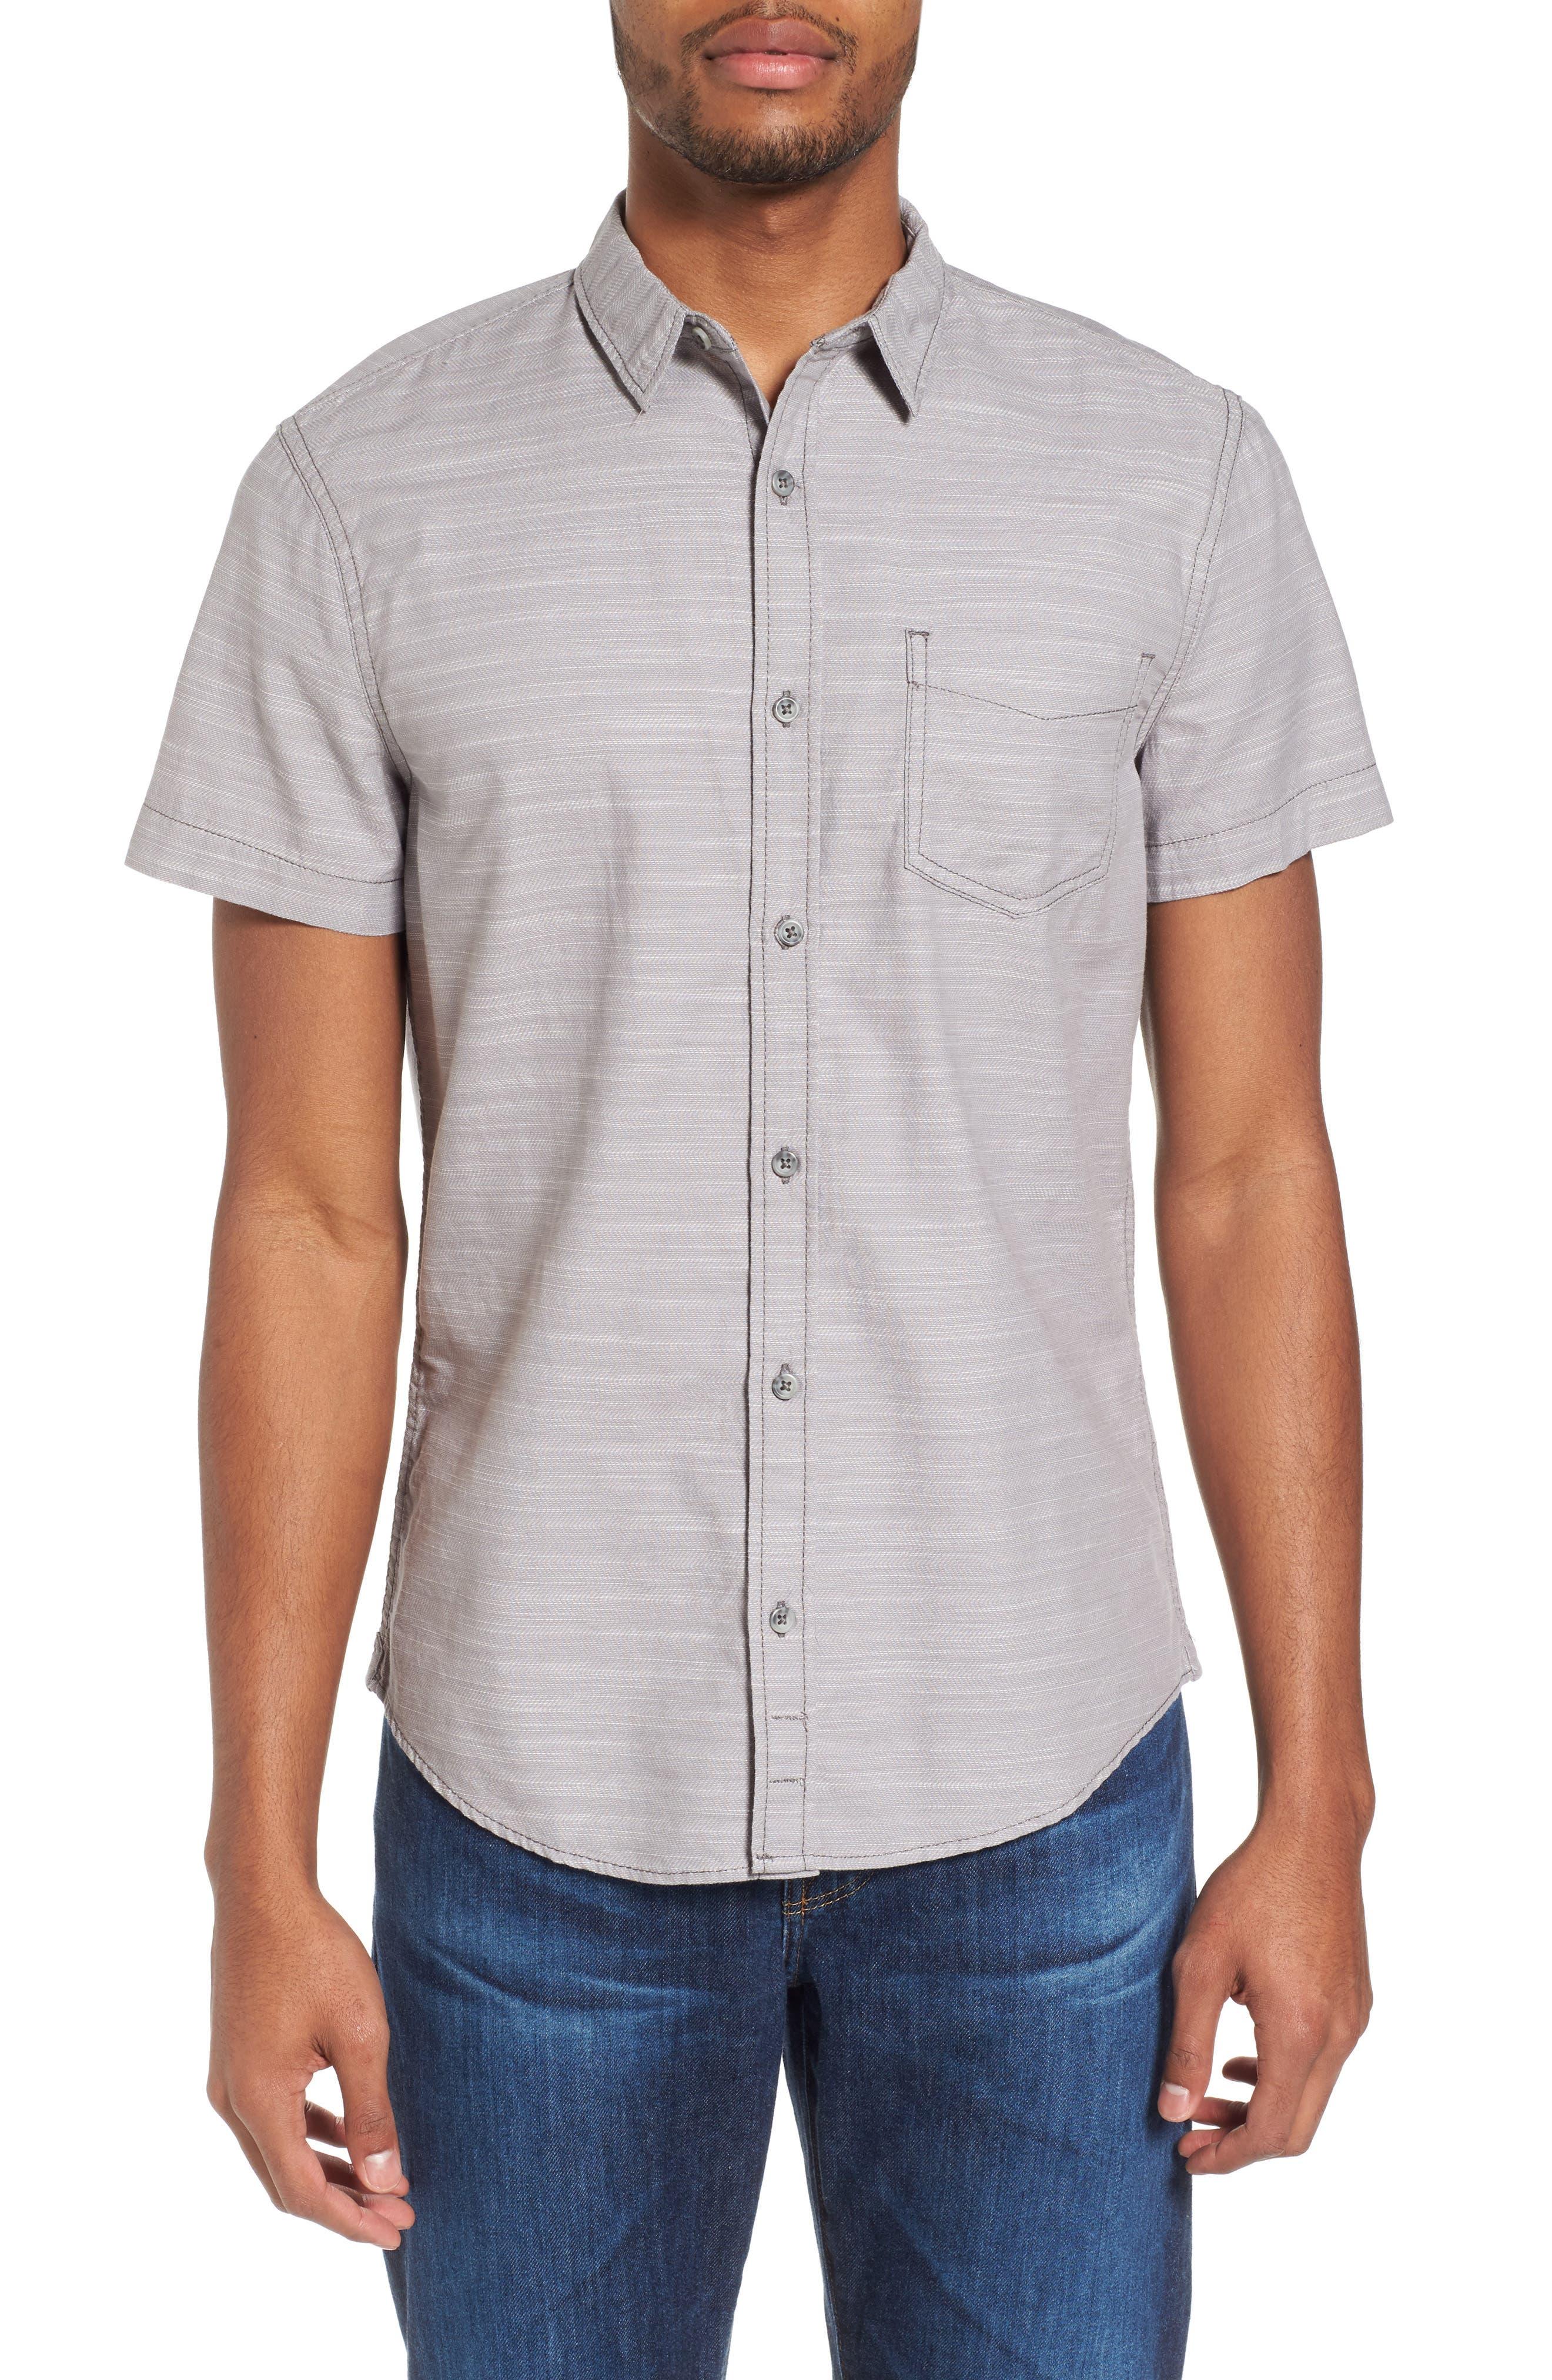 Herringbone Chambray Shirt,                             Main thumbnail 1, color,                             Grey Filigree Herringbone